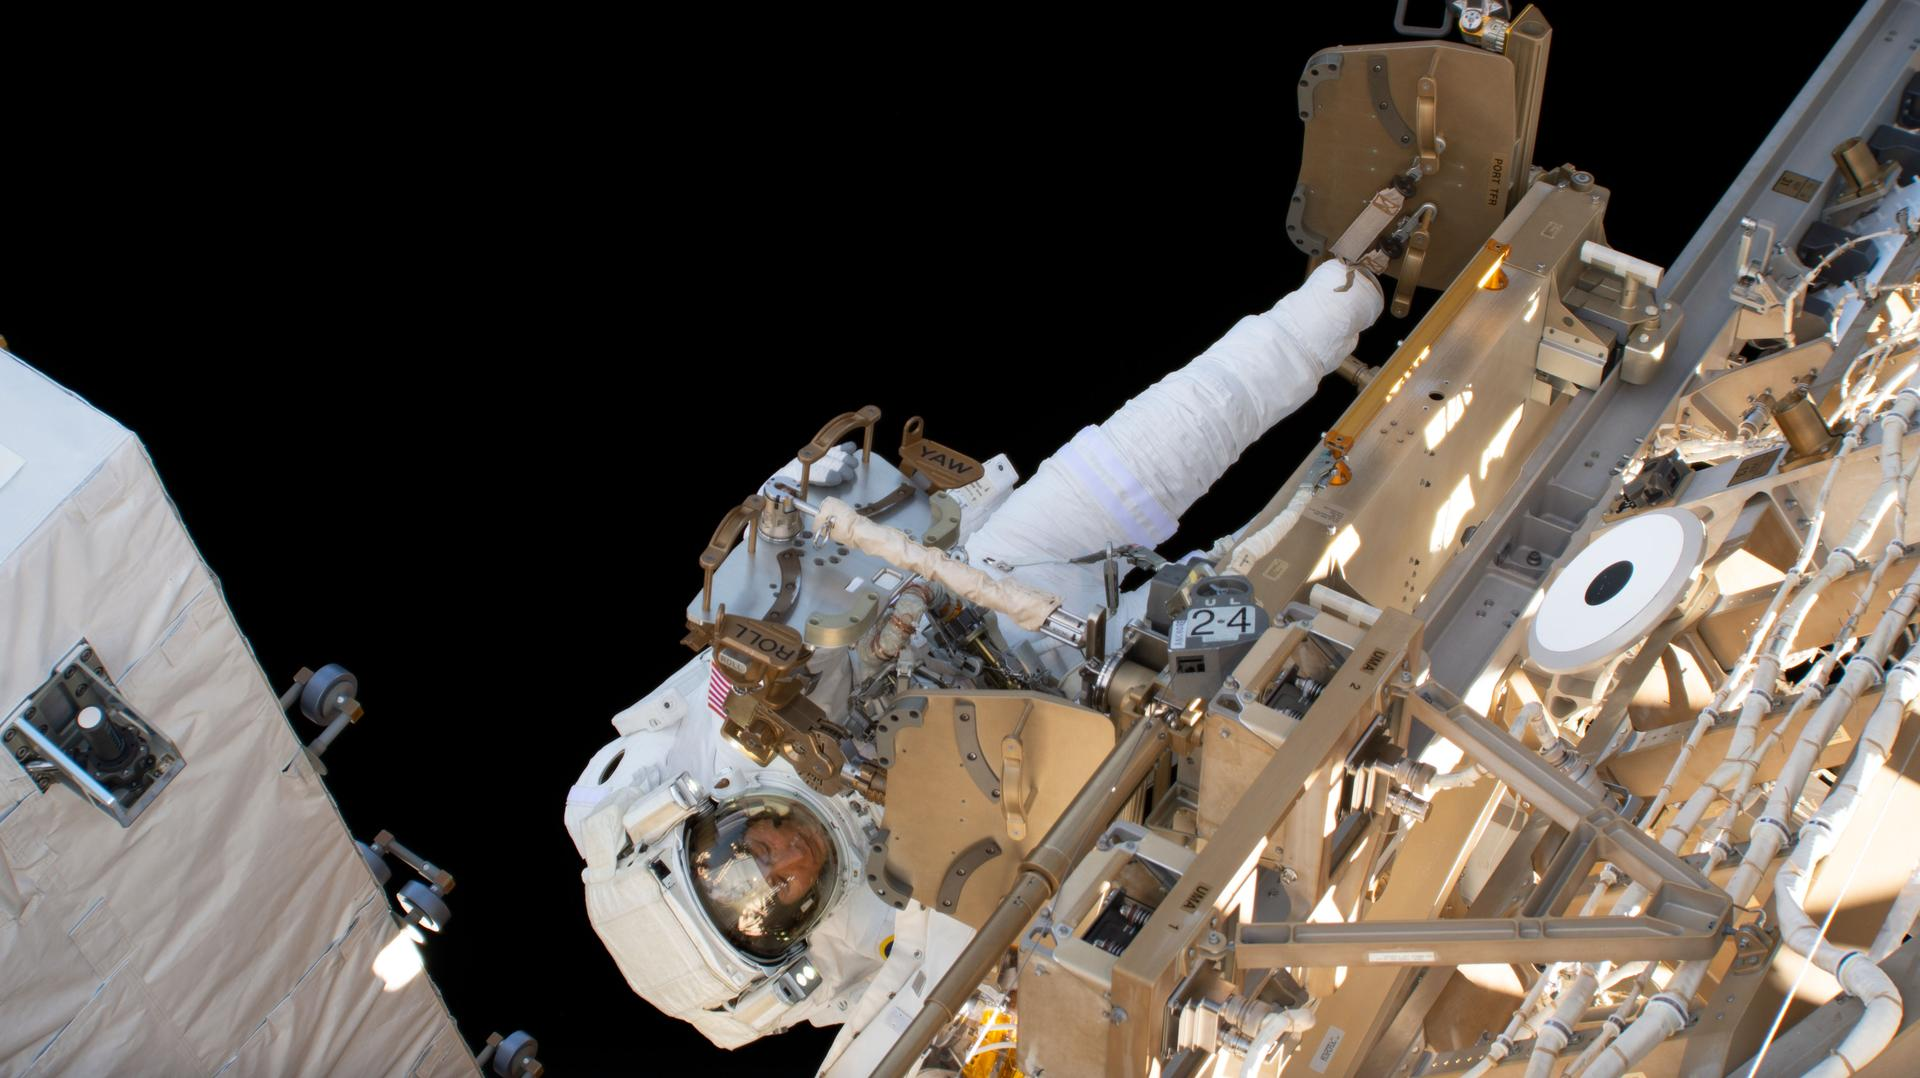 Jessica Meirs första rymdpromenad